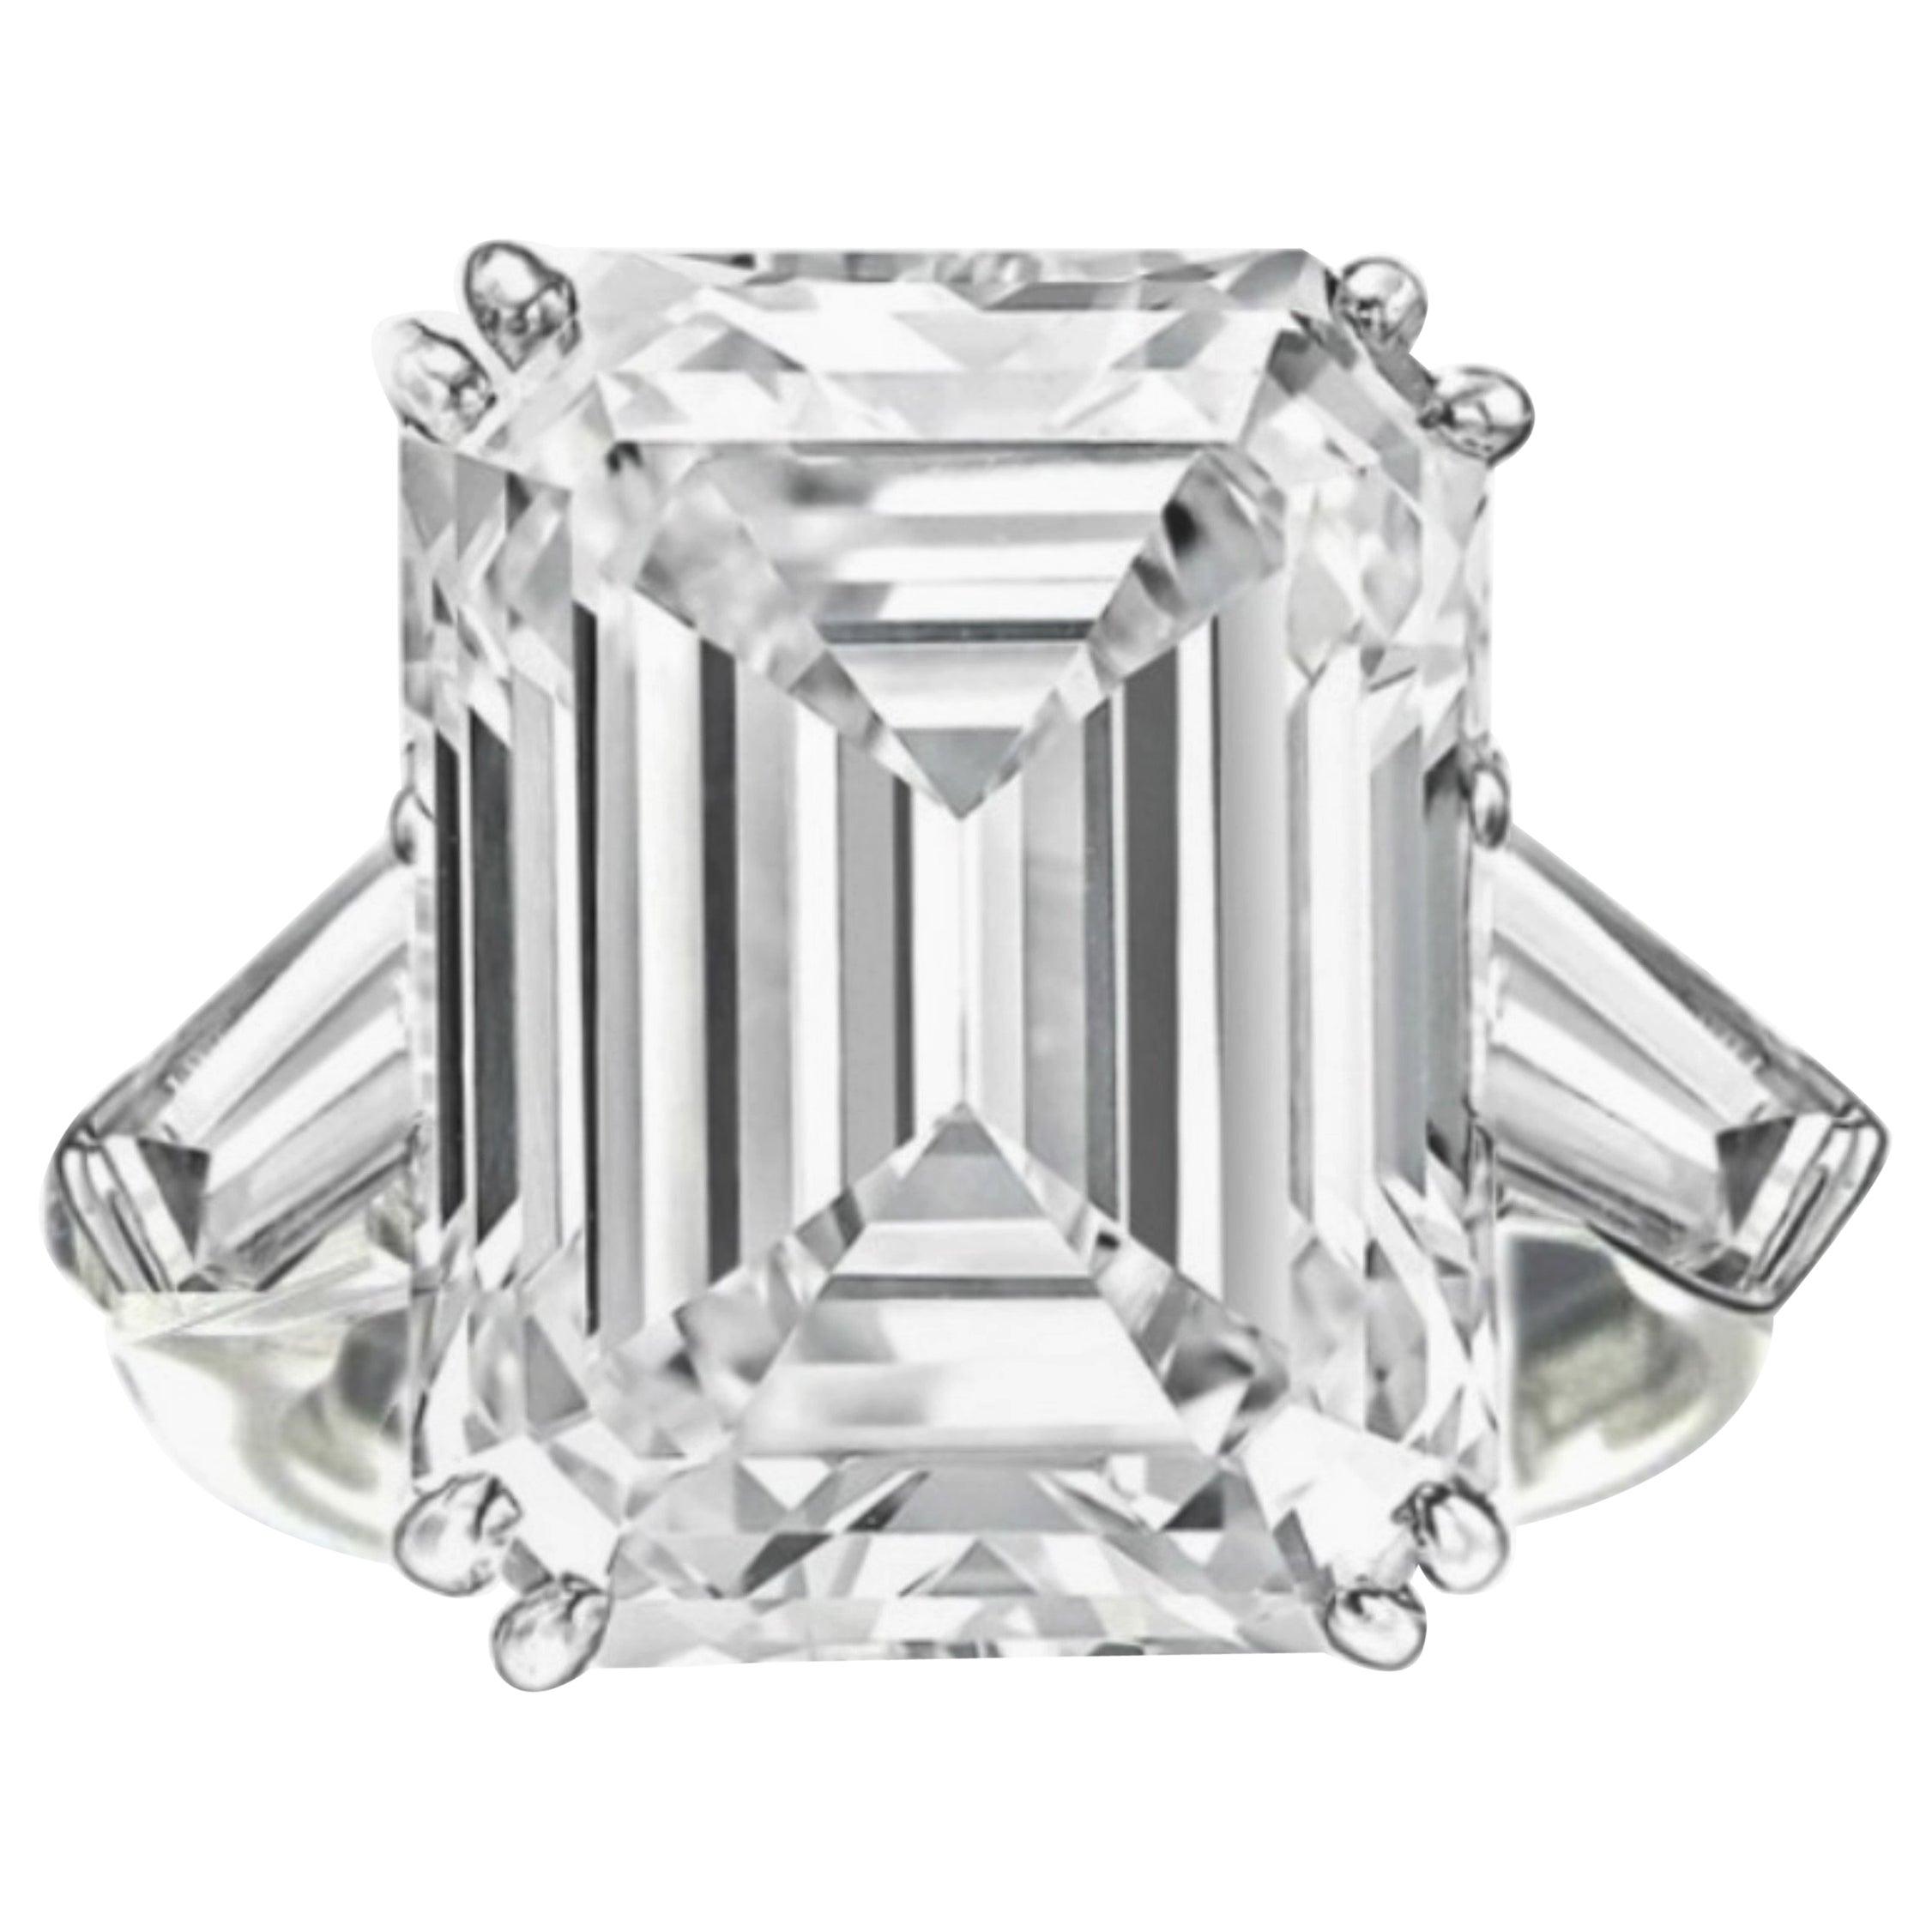 GIA Certified 11.34 Carat H-VS1 Emerald Cut Diamond Ring